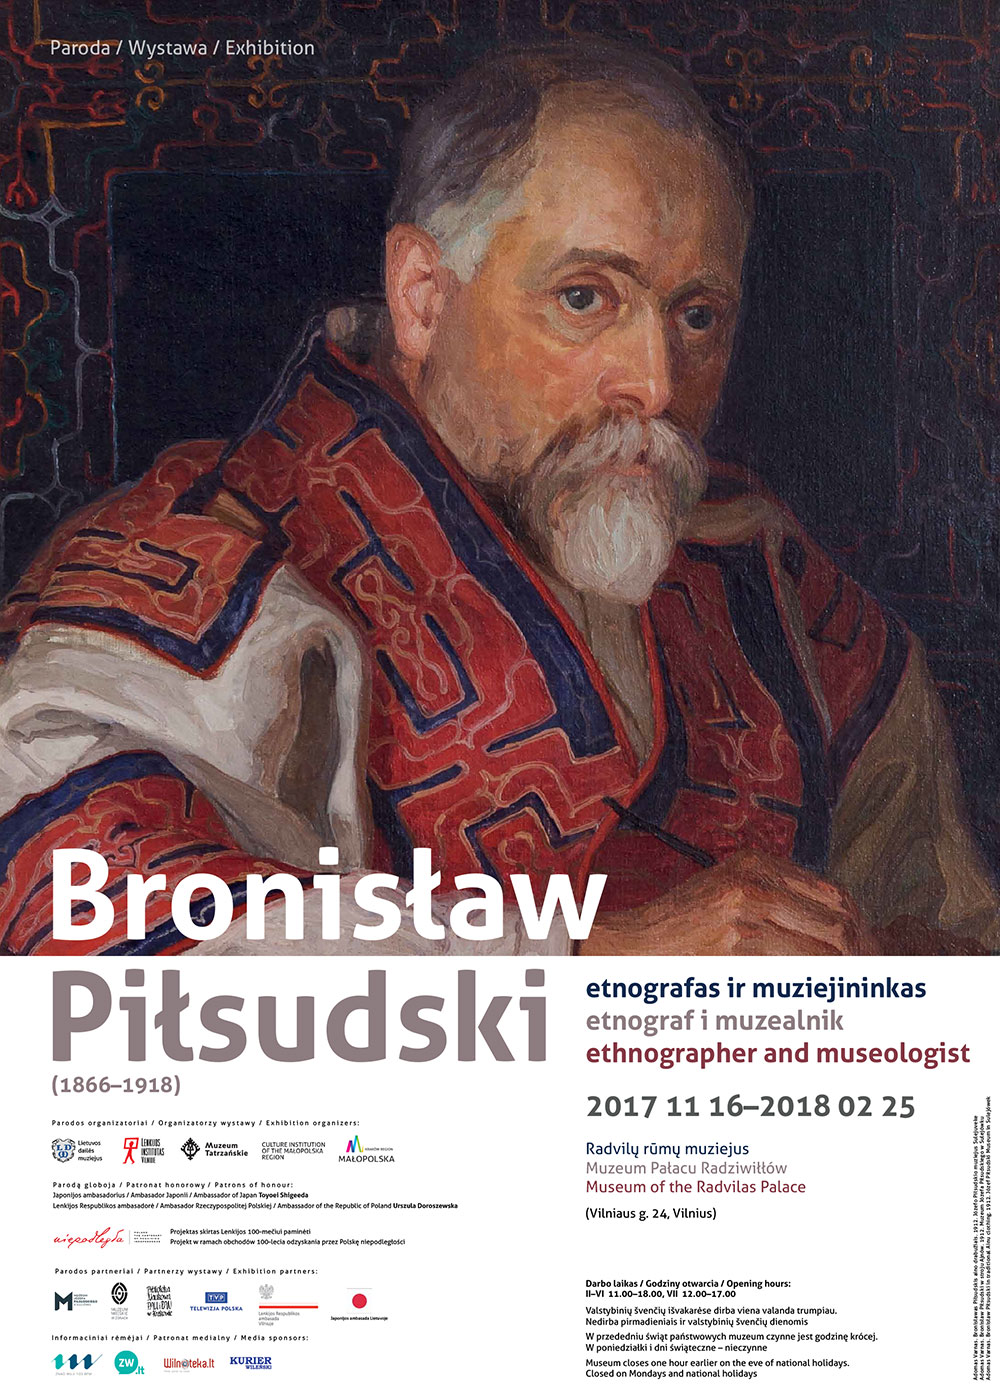 BRONISŁAW PIŁSUDSKI (1866-1918). ETNOGRAF I MUZEALNIK